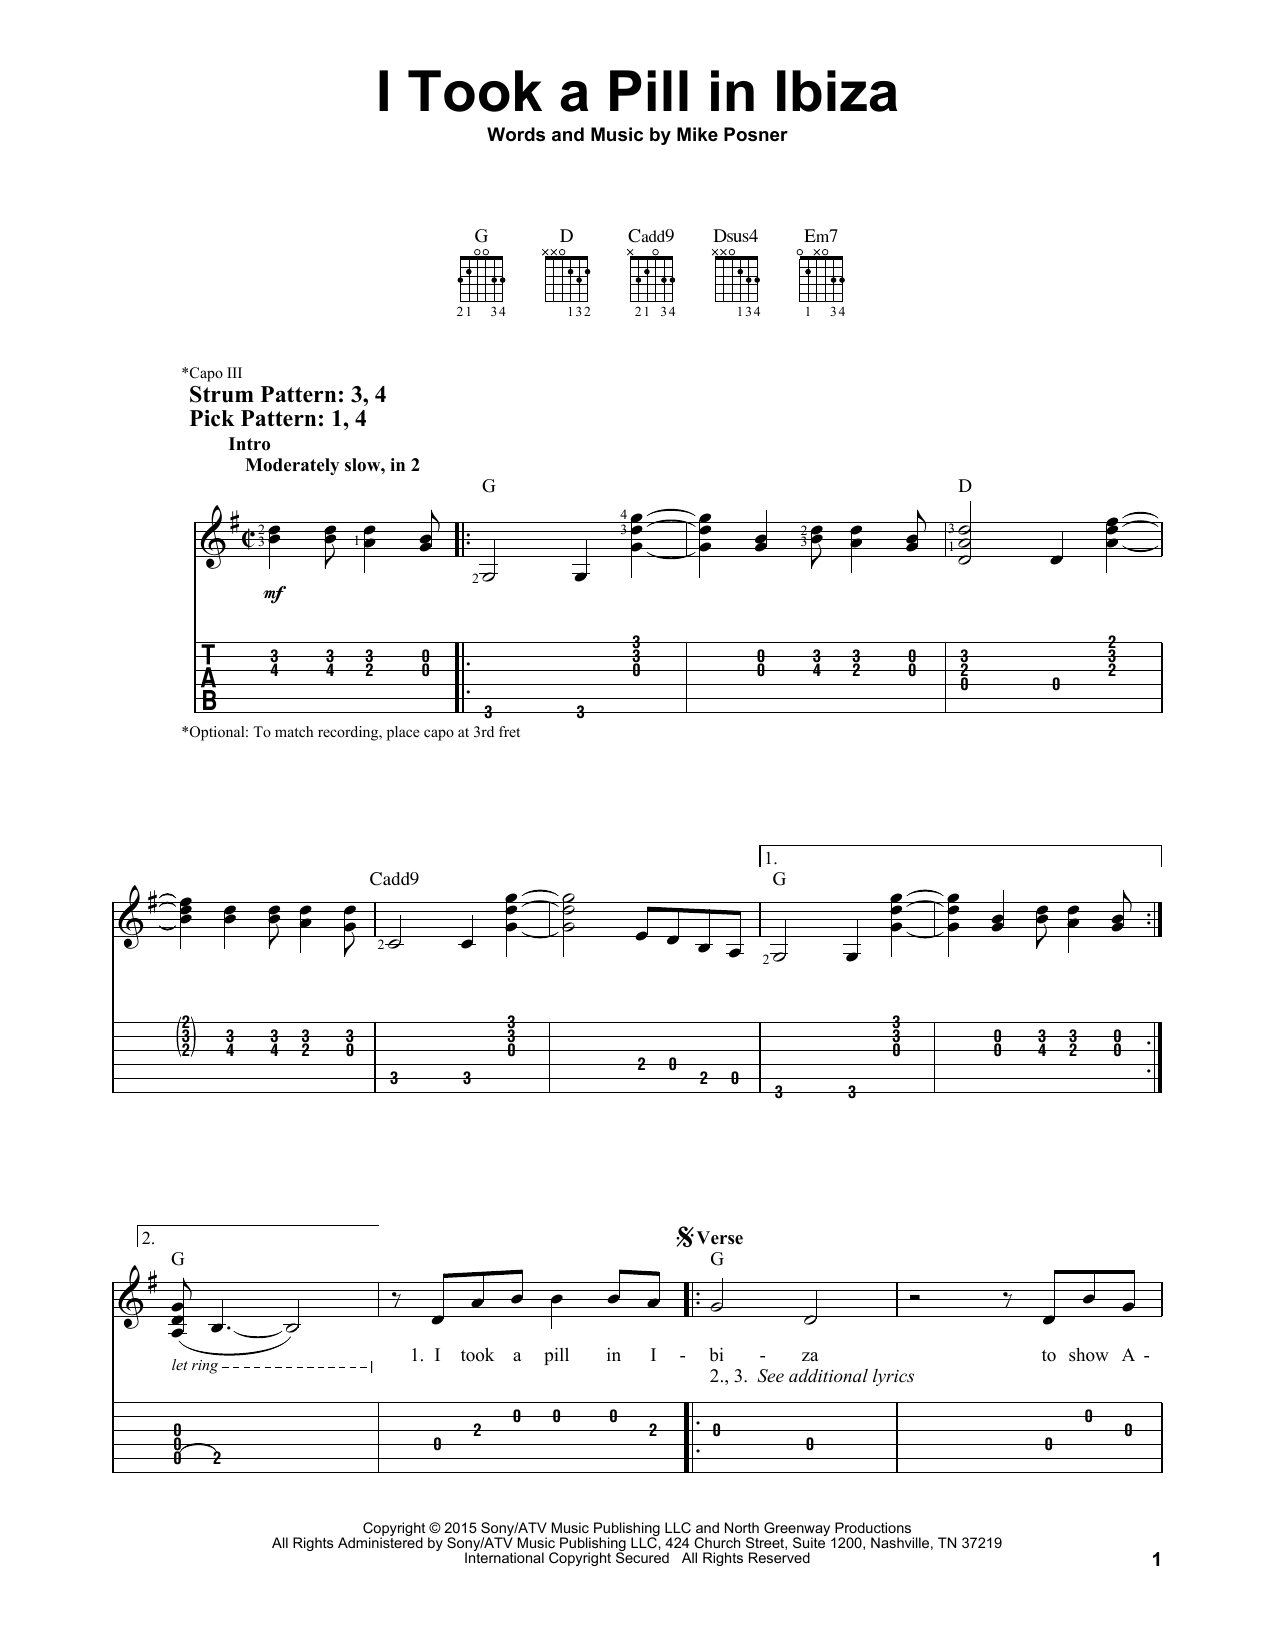 Sheet Music Digital Files To Print Licensed Mike Posner Digital